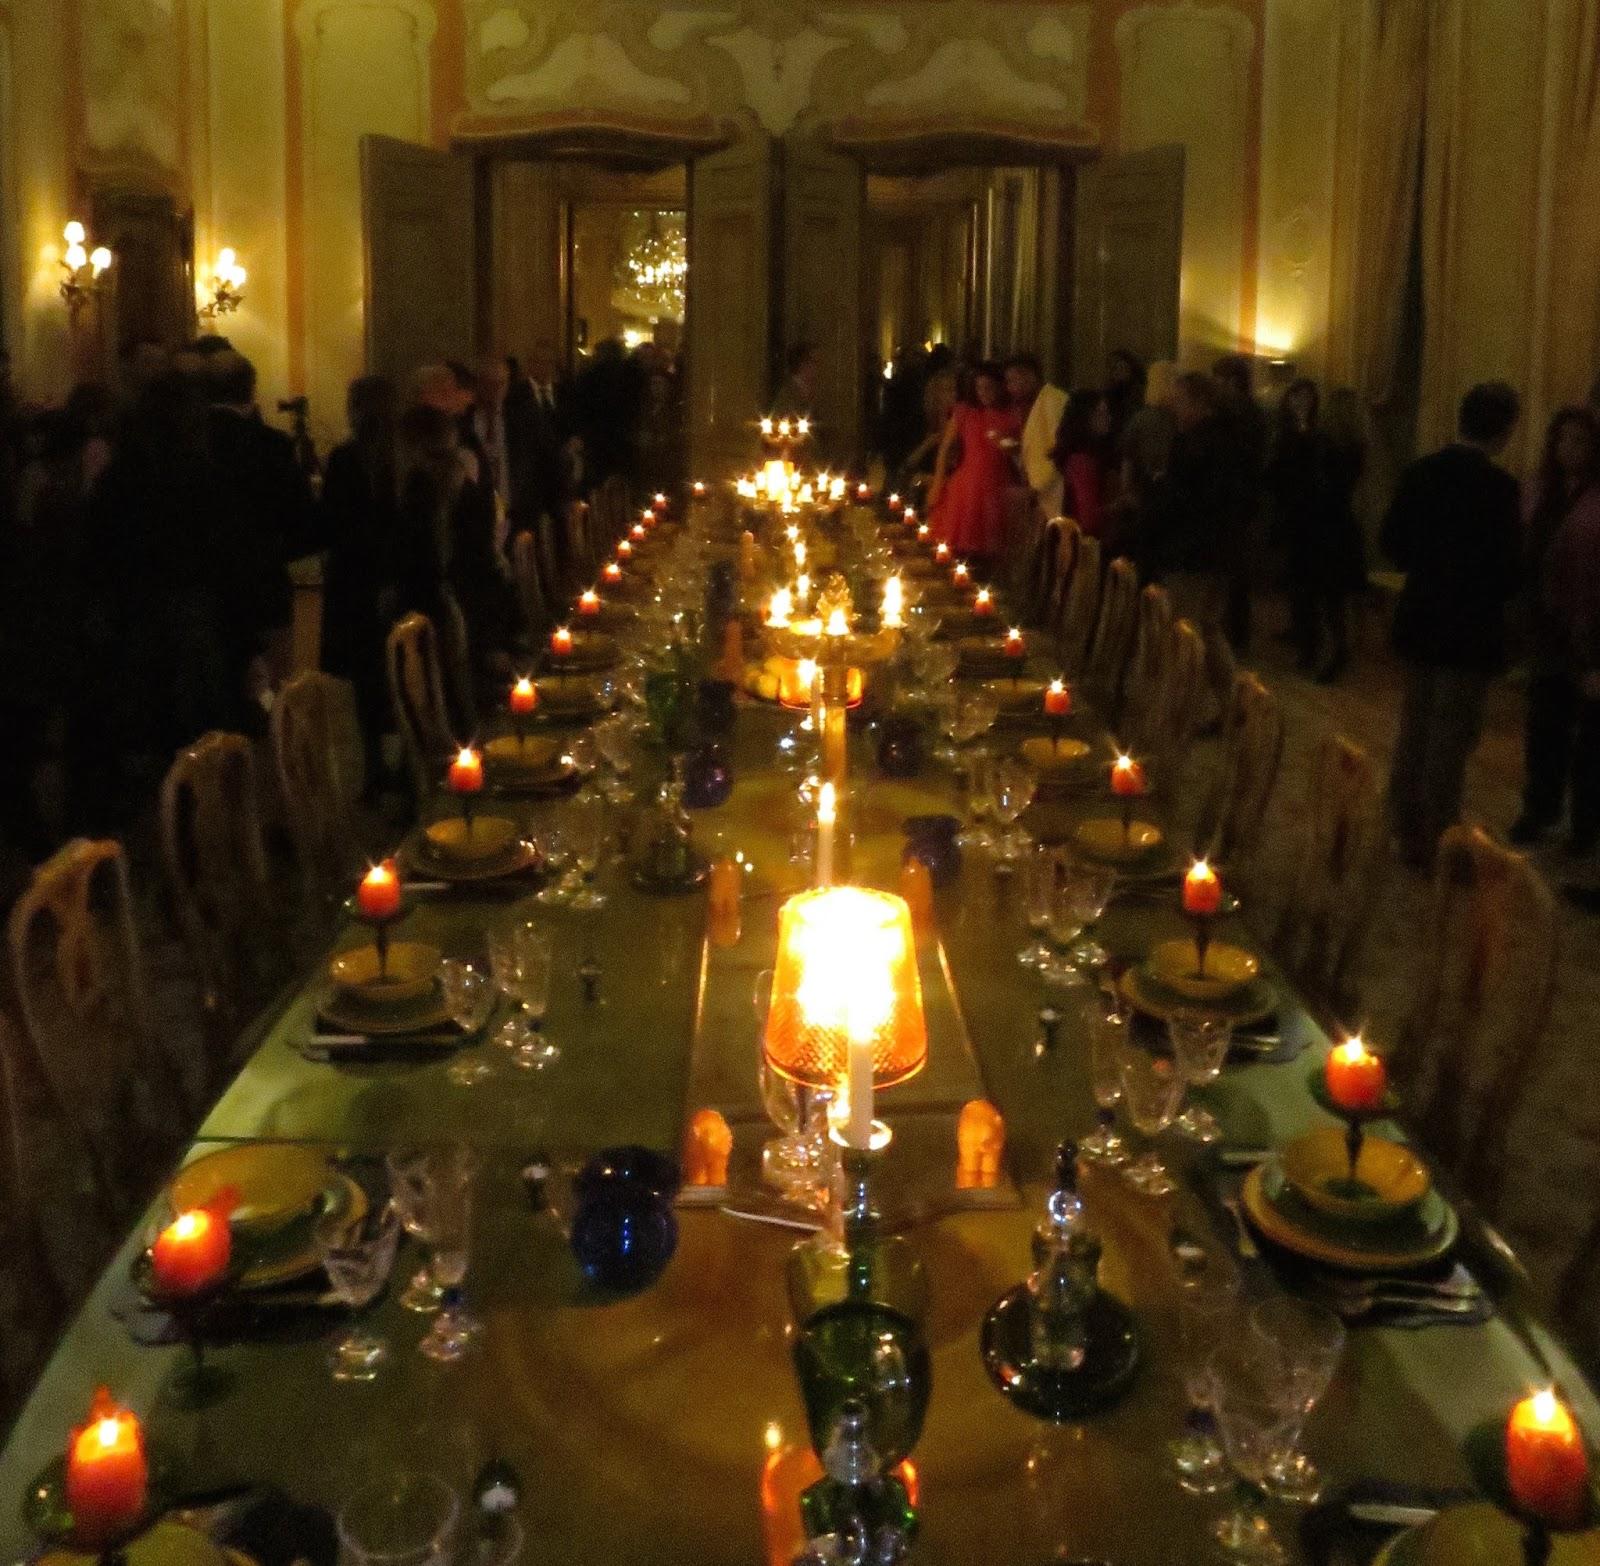 International luxury consulting ambassade d 39 italie en for Bureau de poste paris 13 avenue d italie